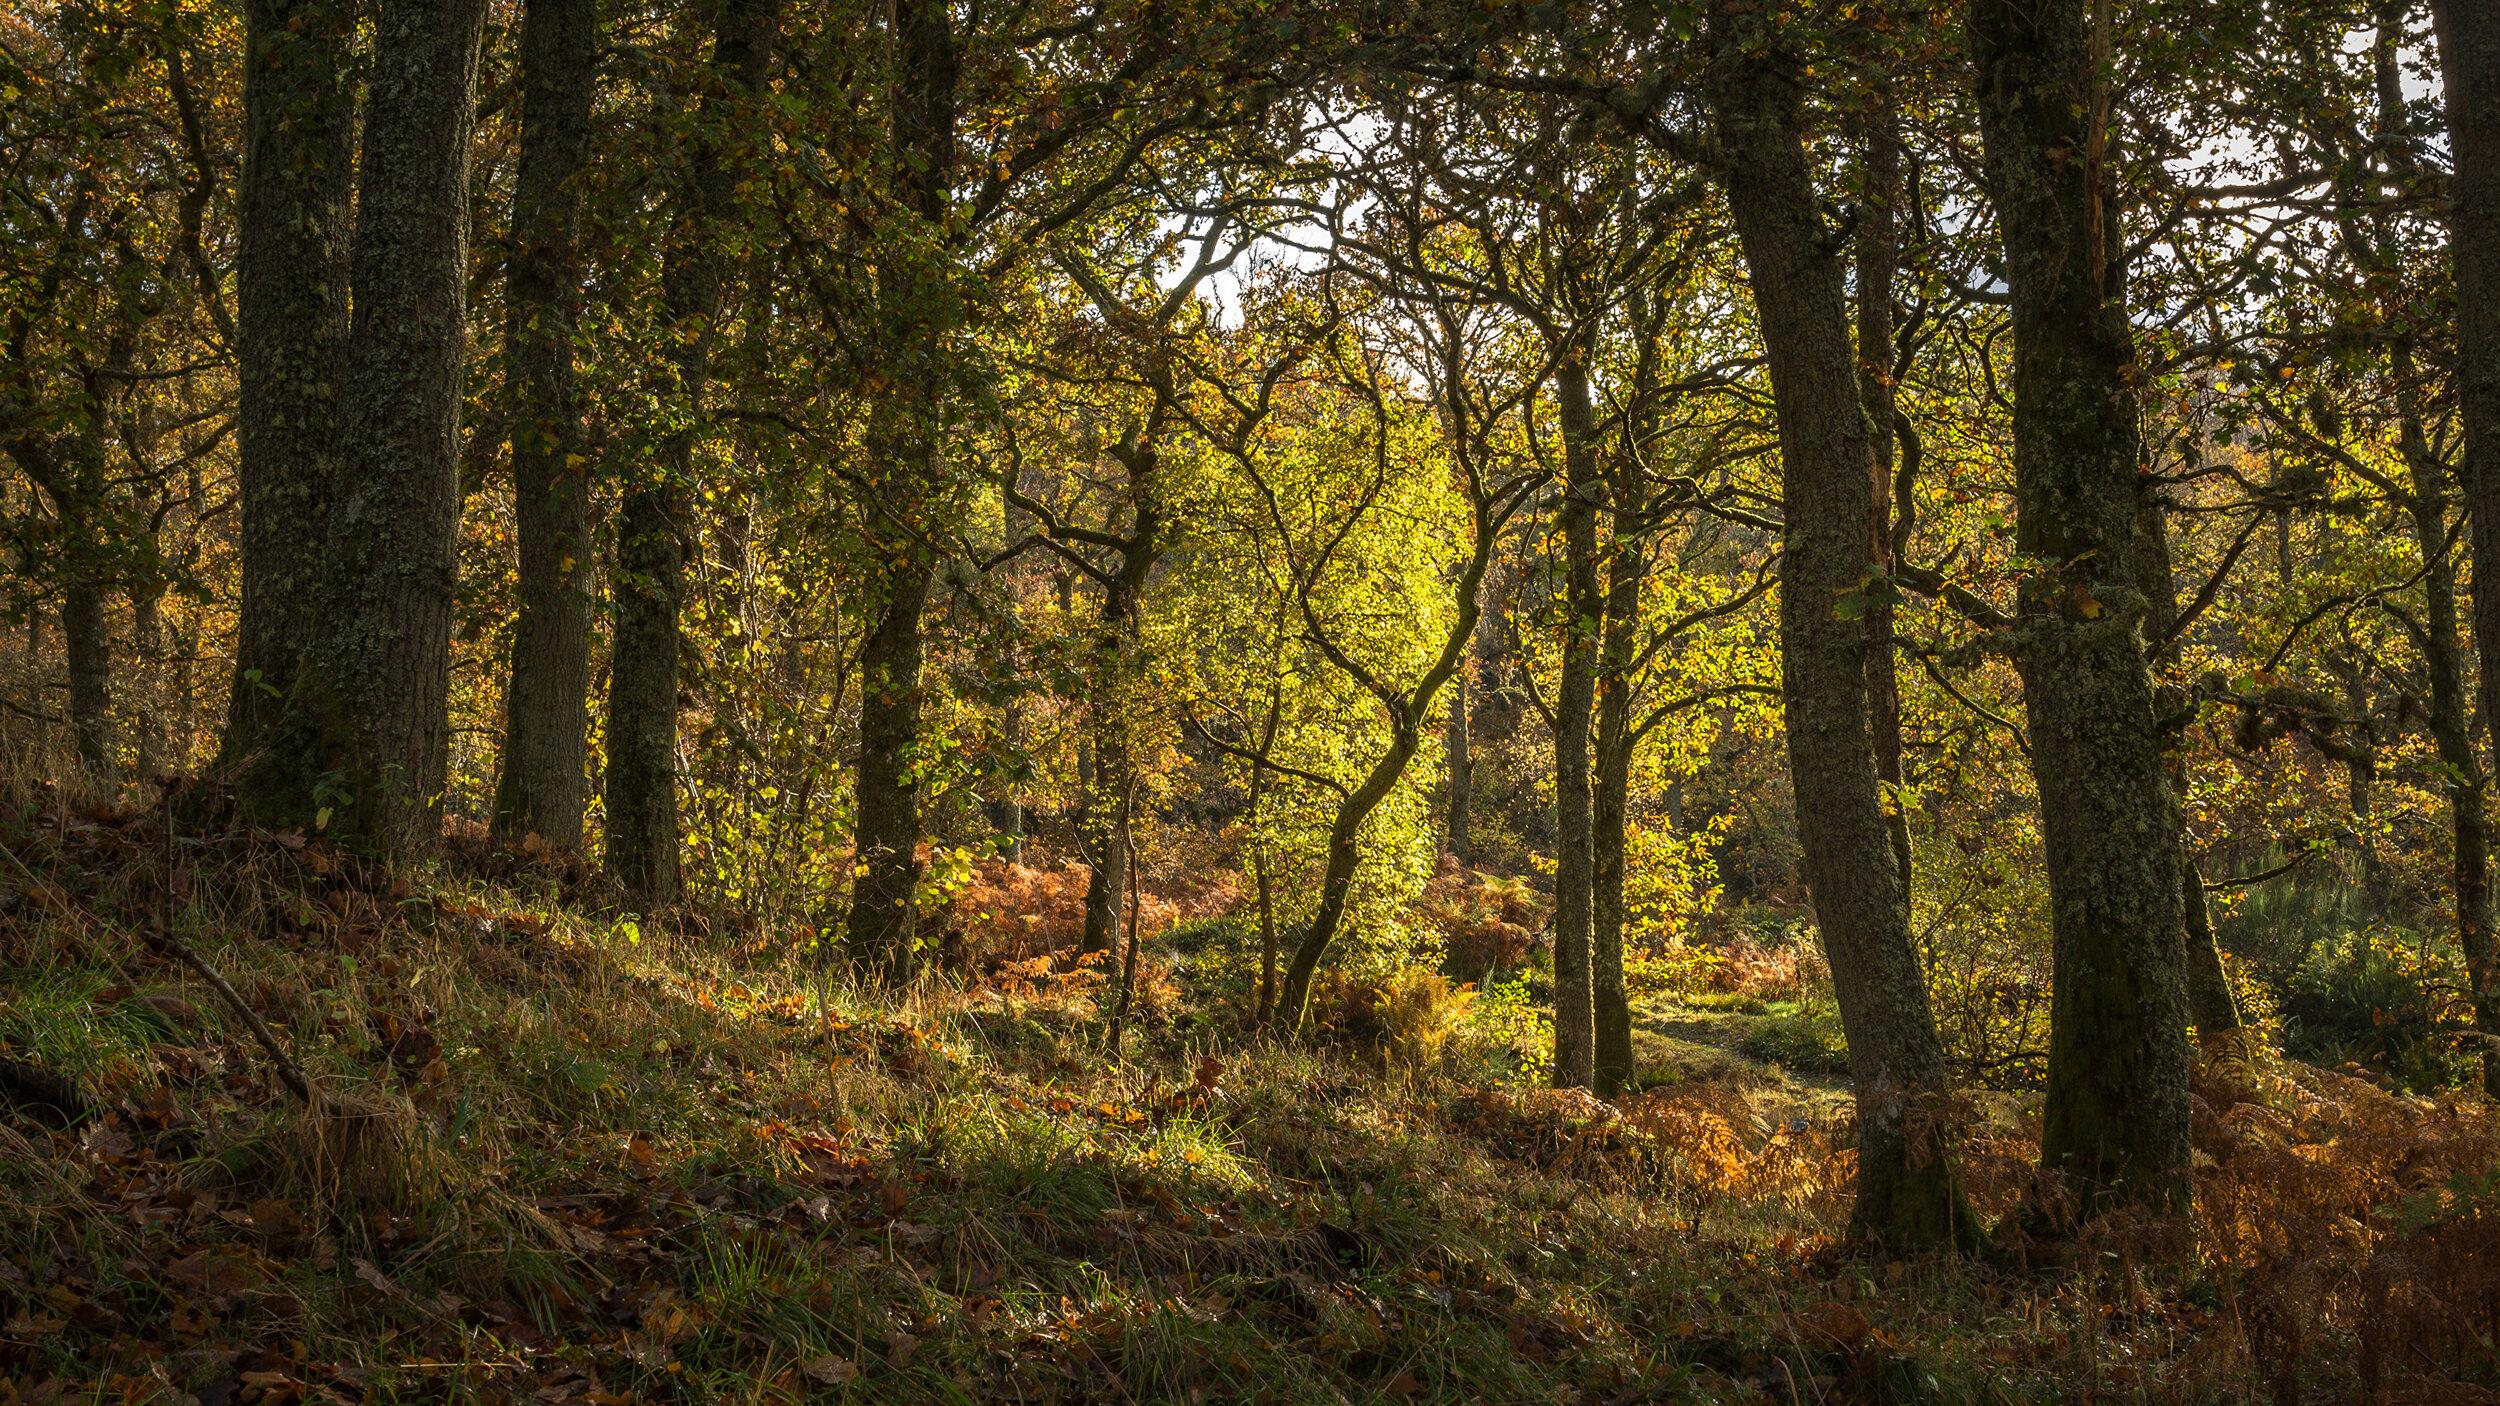 Scotland_Forests_489854_3840x2160.jpg